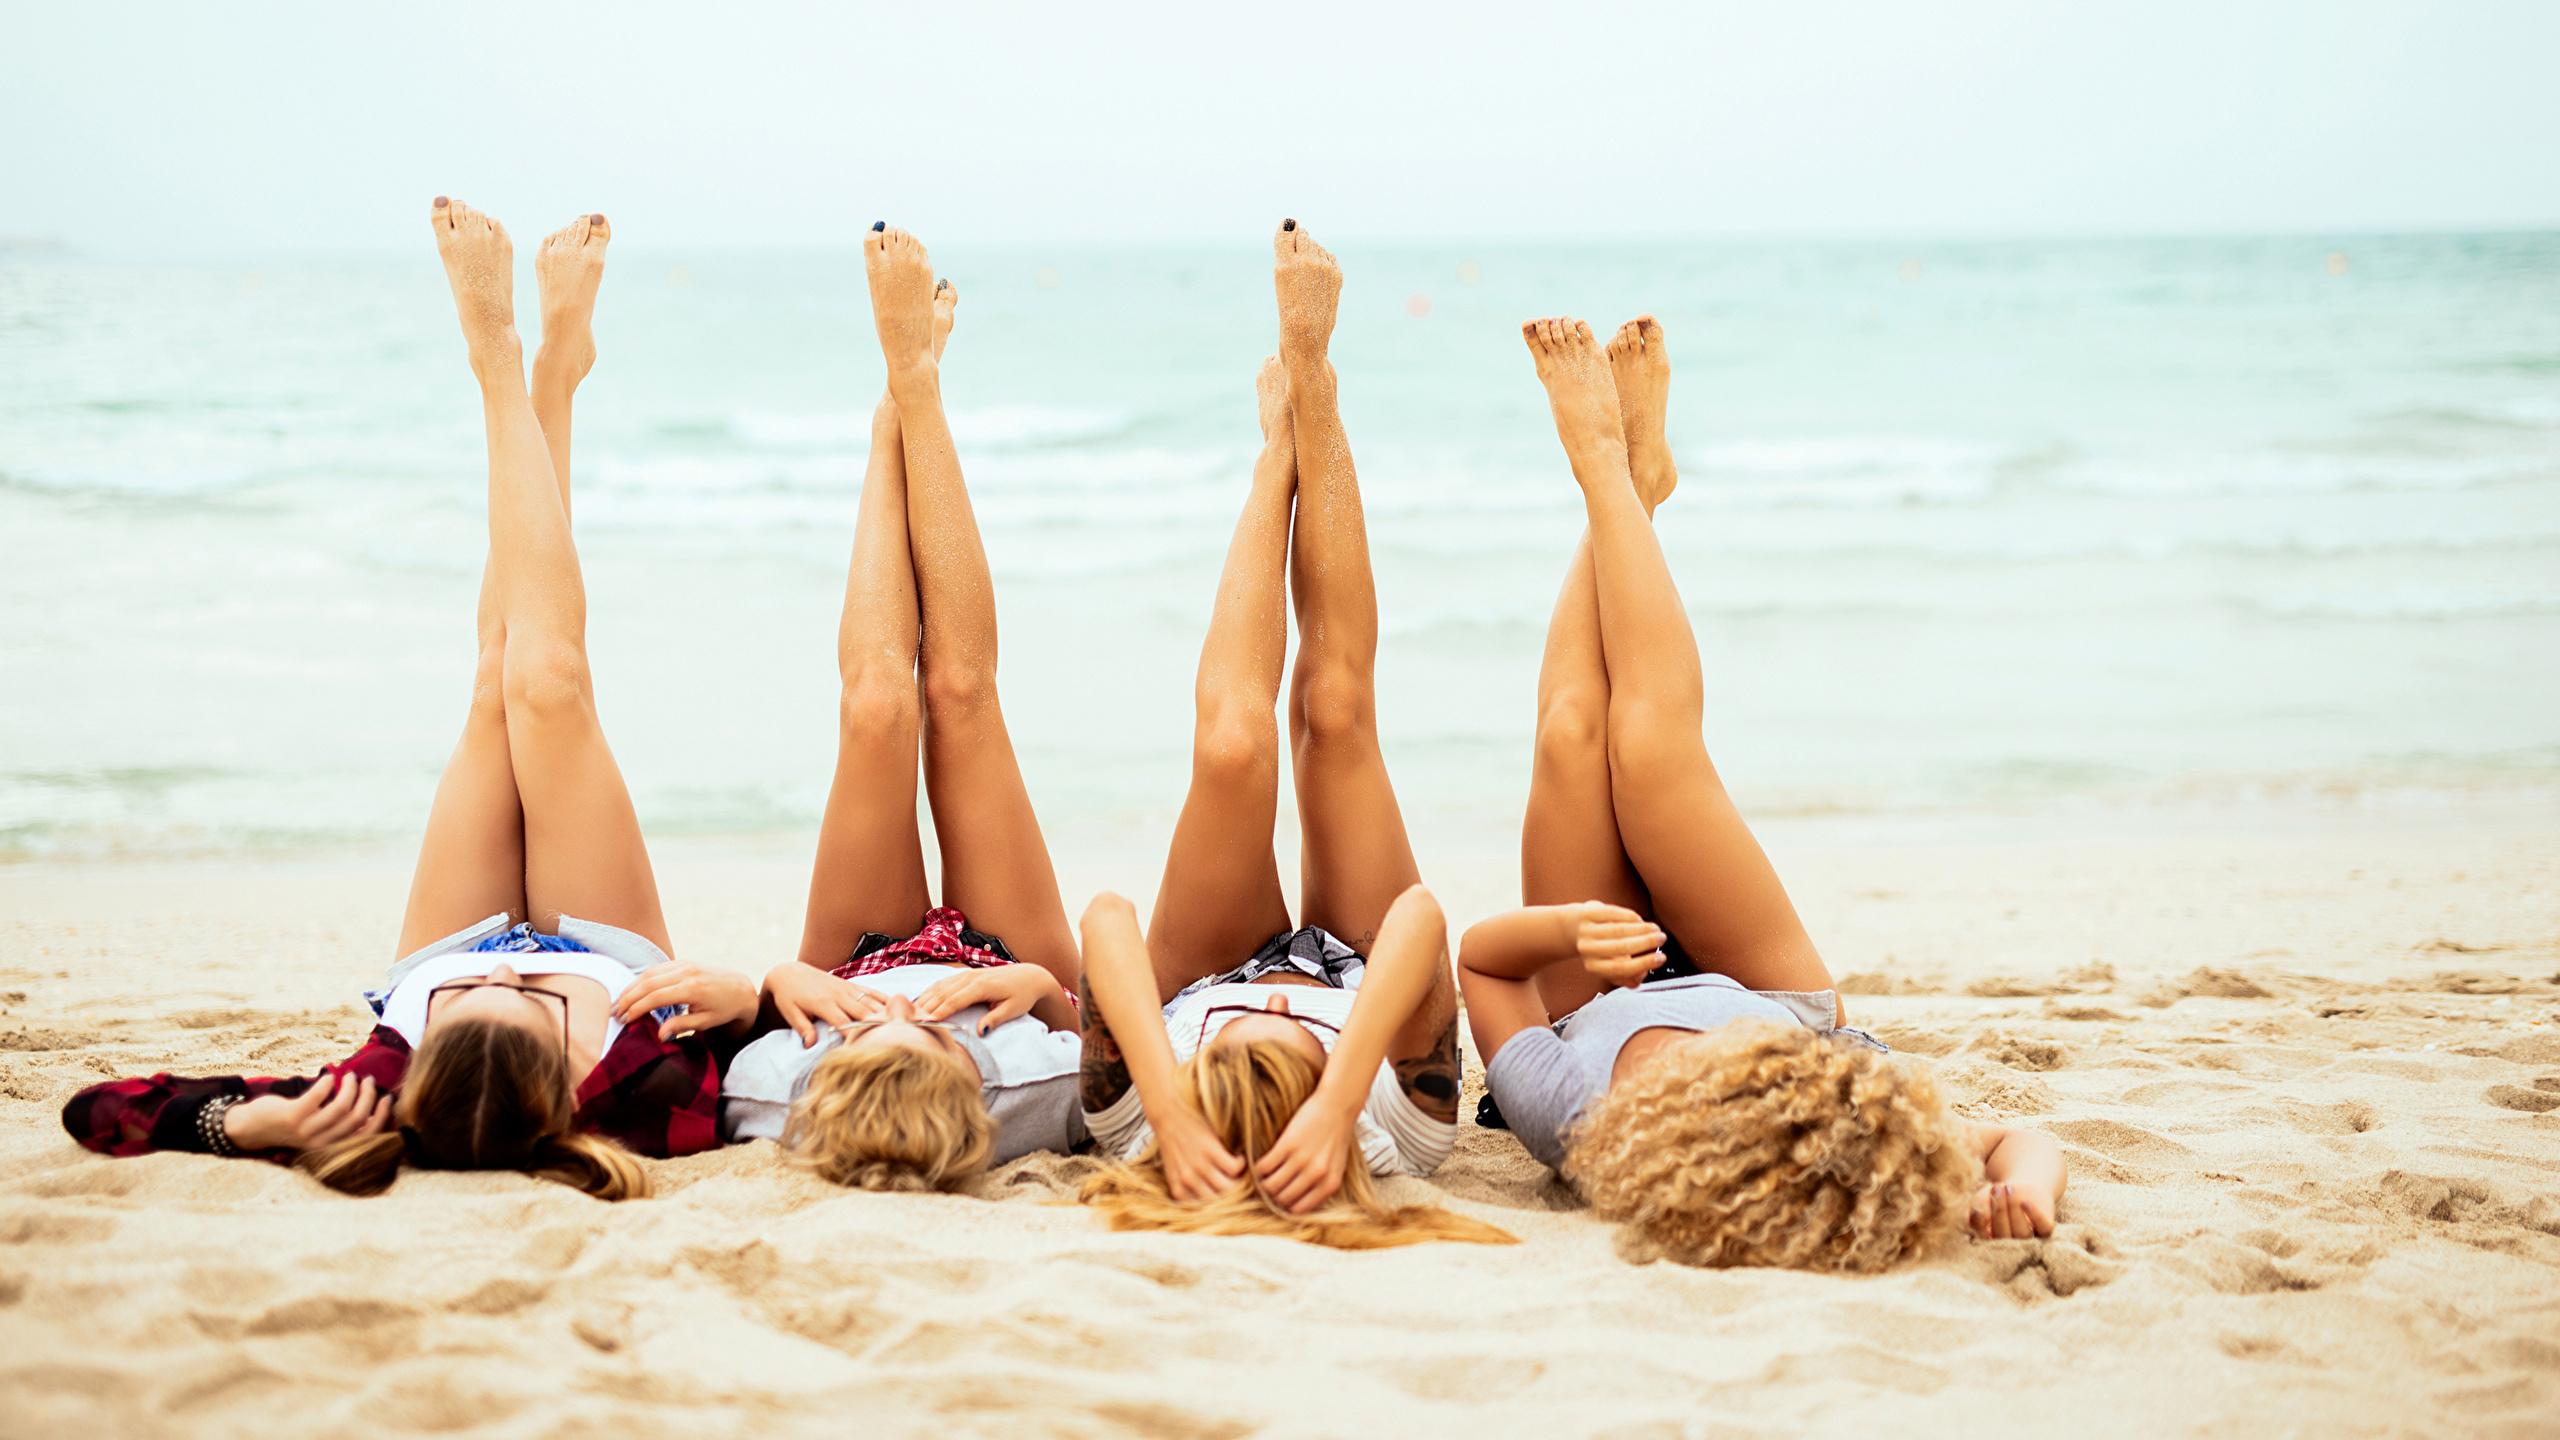 Image Girls Blonde Girl Beach Four 4 Legs 2560x1440